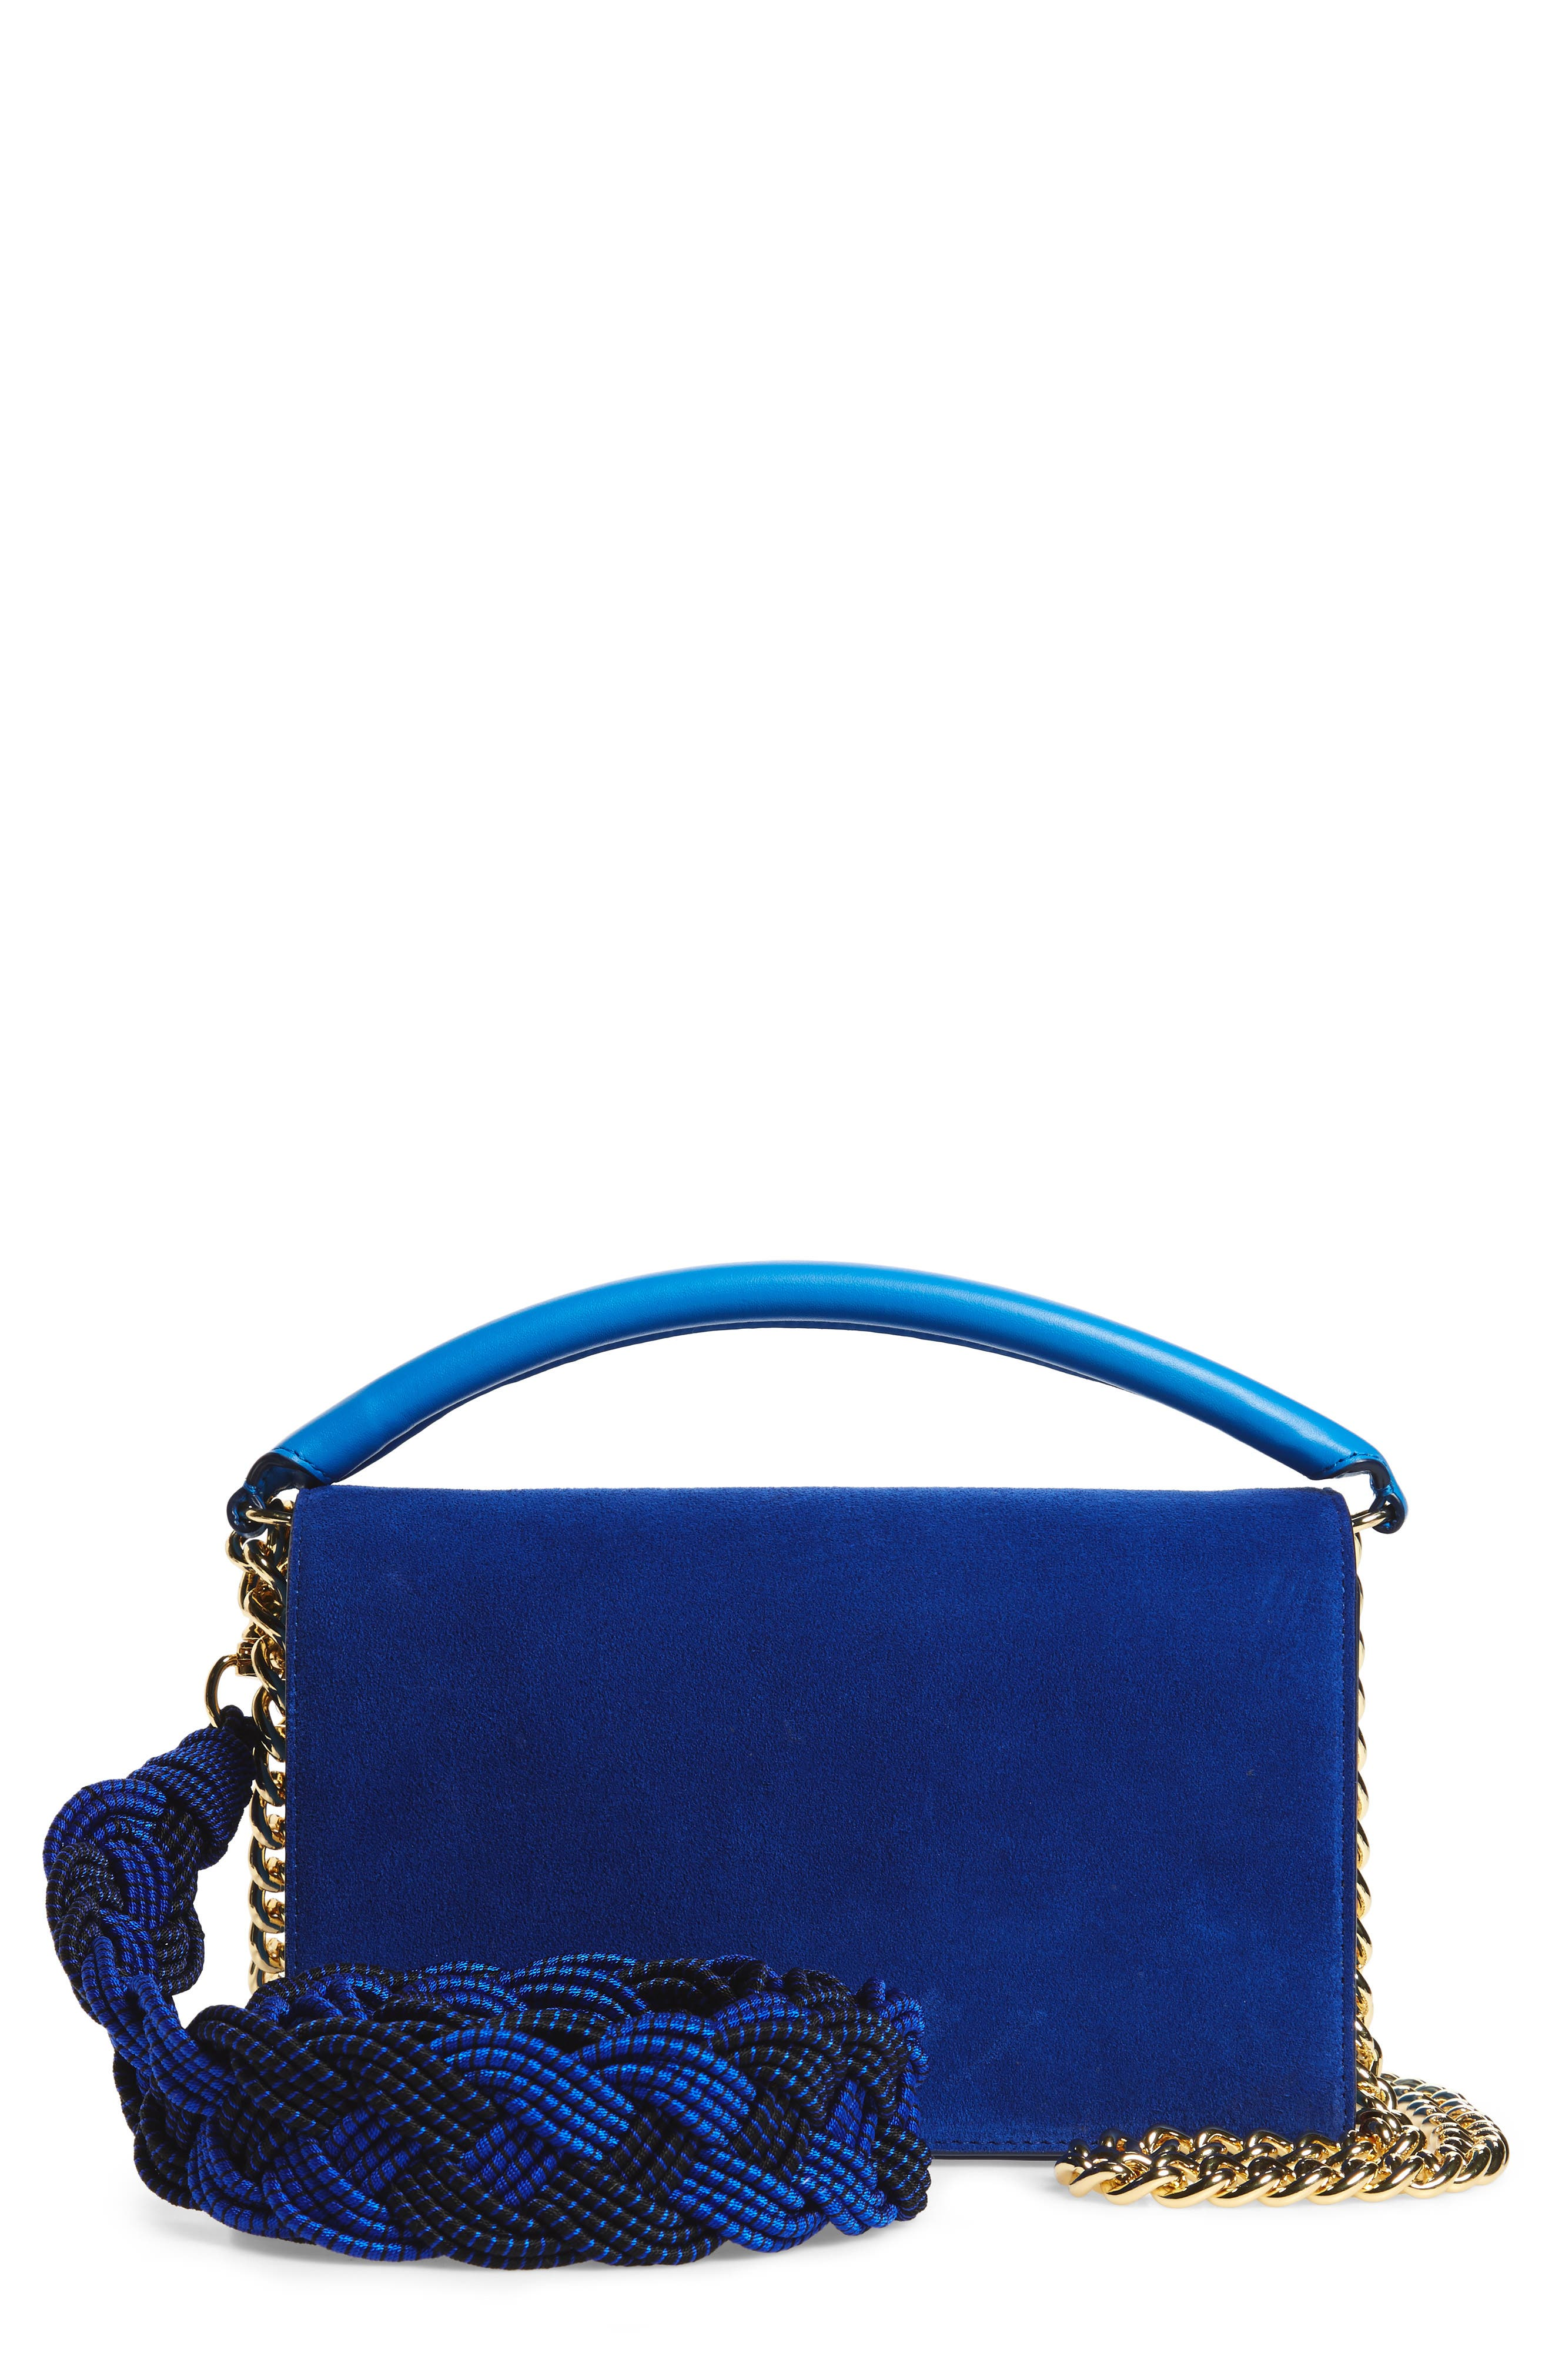 Diane von Furstenberg Bonne Soirée Leather & Suede Top Handle Bag